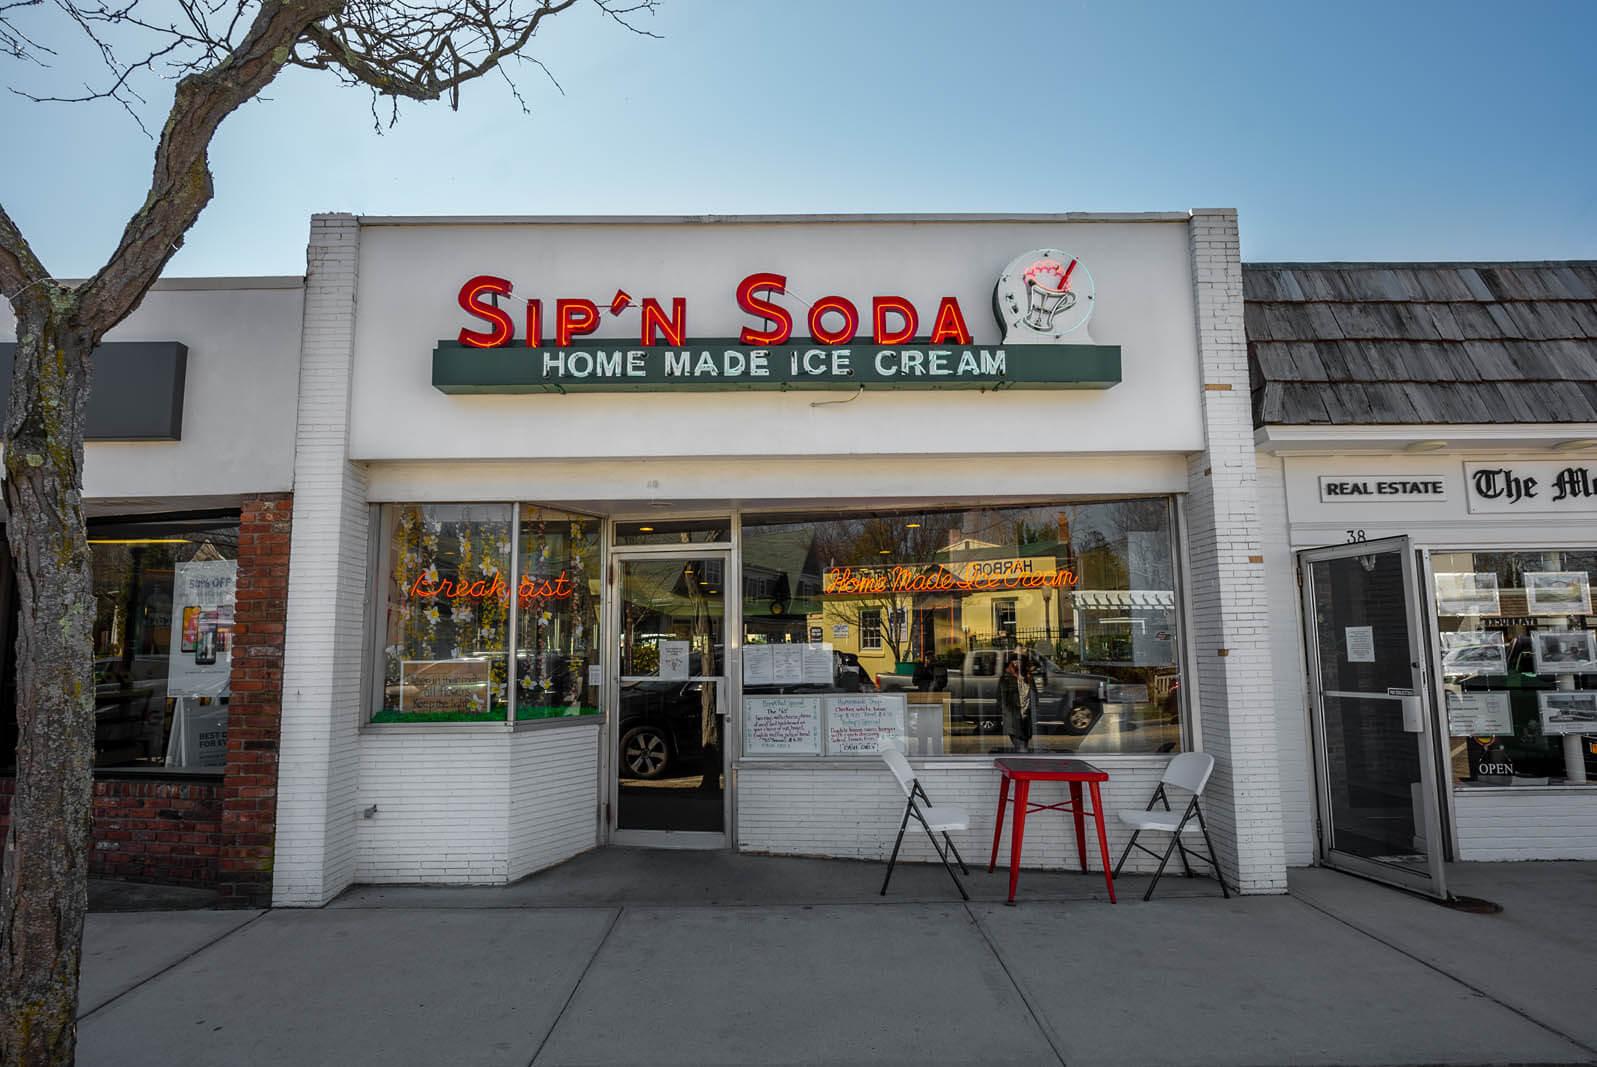 Sip n soda in south hampton in long island new york